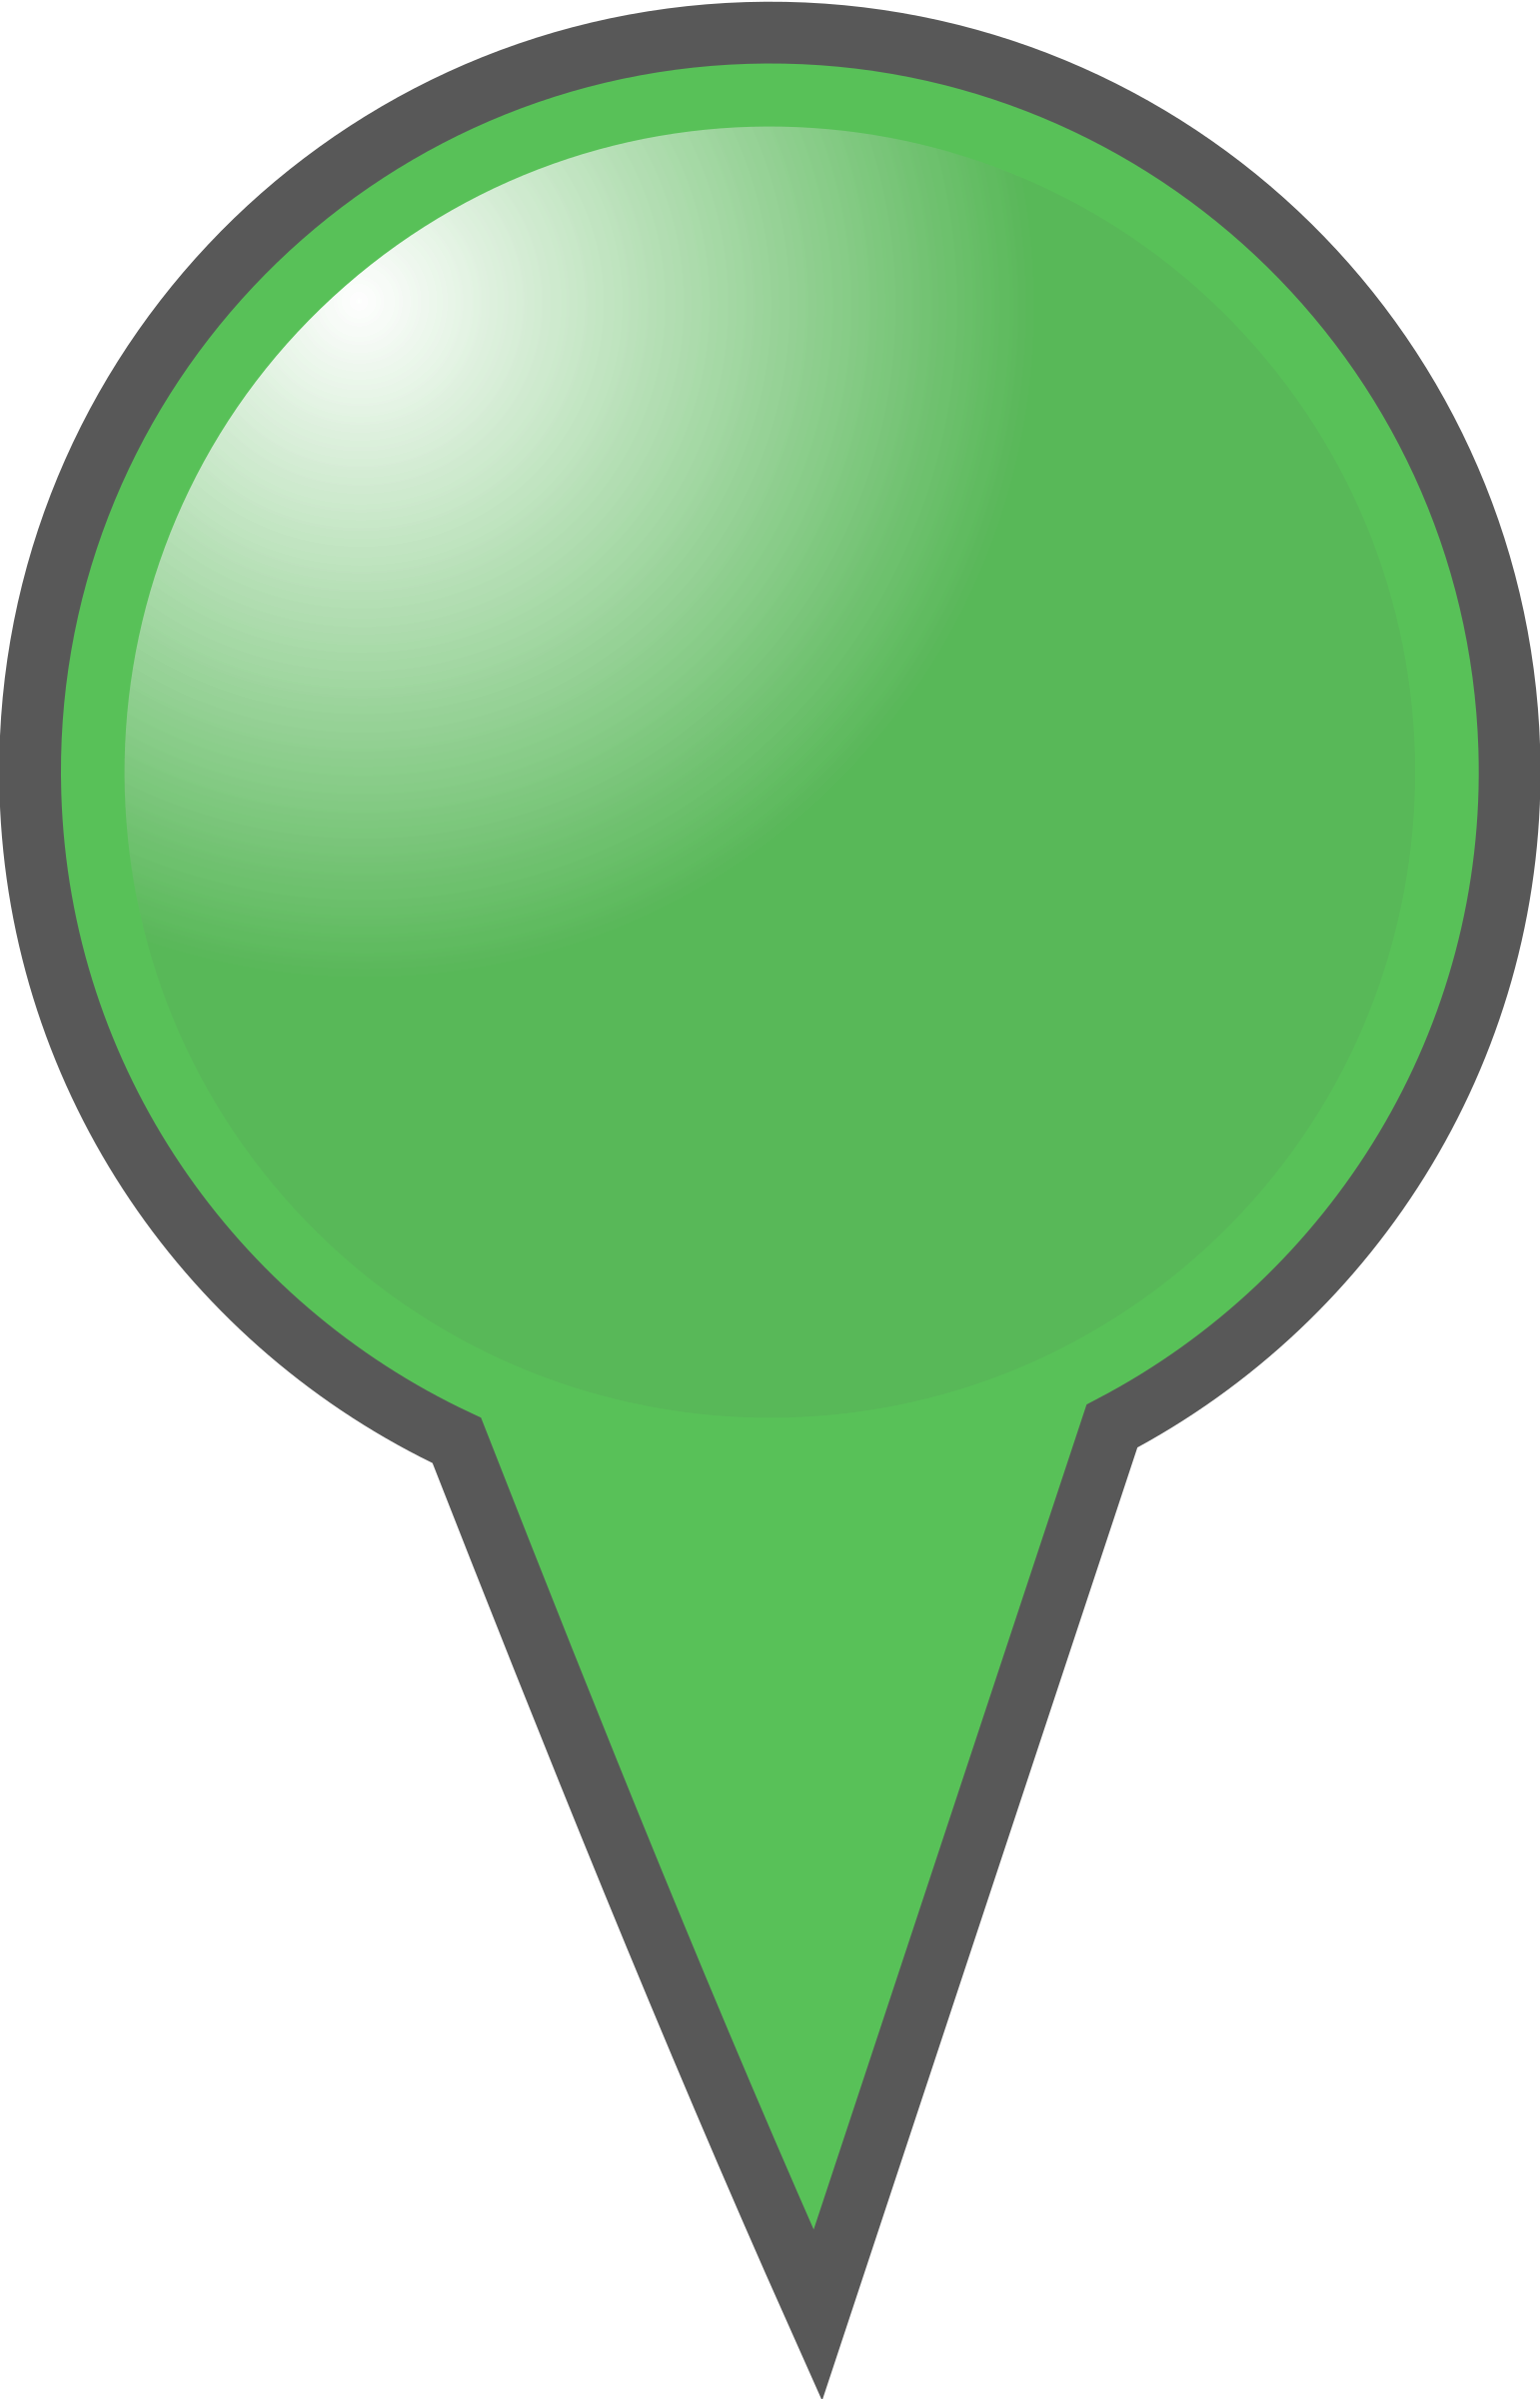 jpg Marker clipart. Green map big image